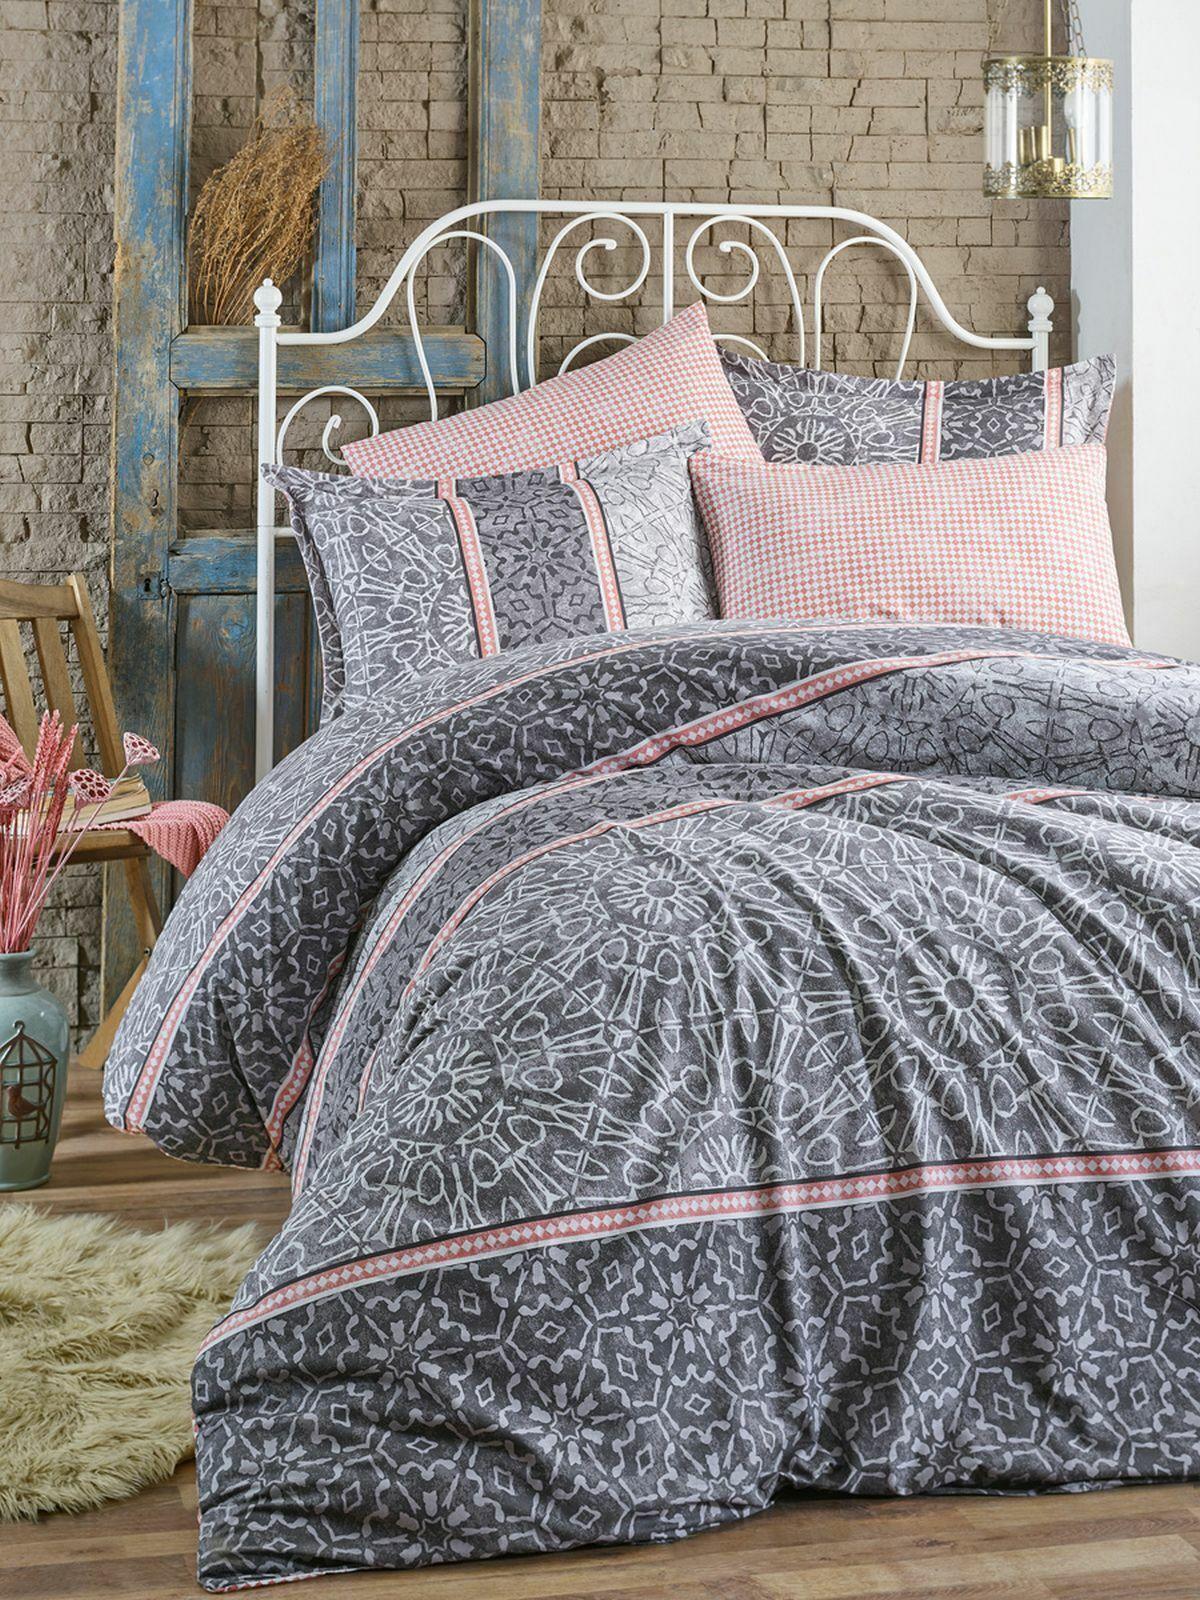 BETTWÄSCHE 200x220 cm Flanell Bettbezug Kissenbezug doppelseitig